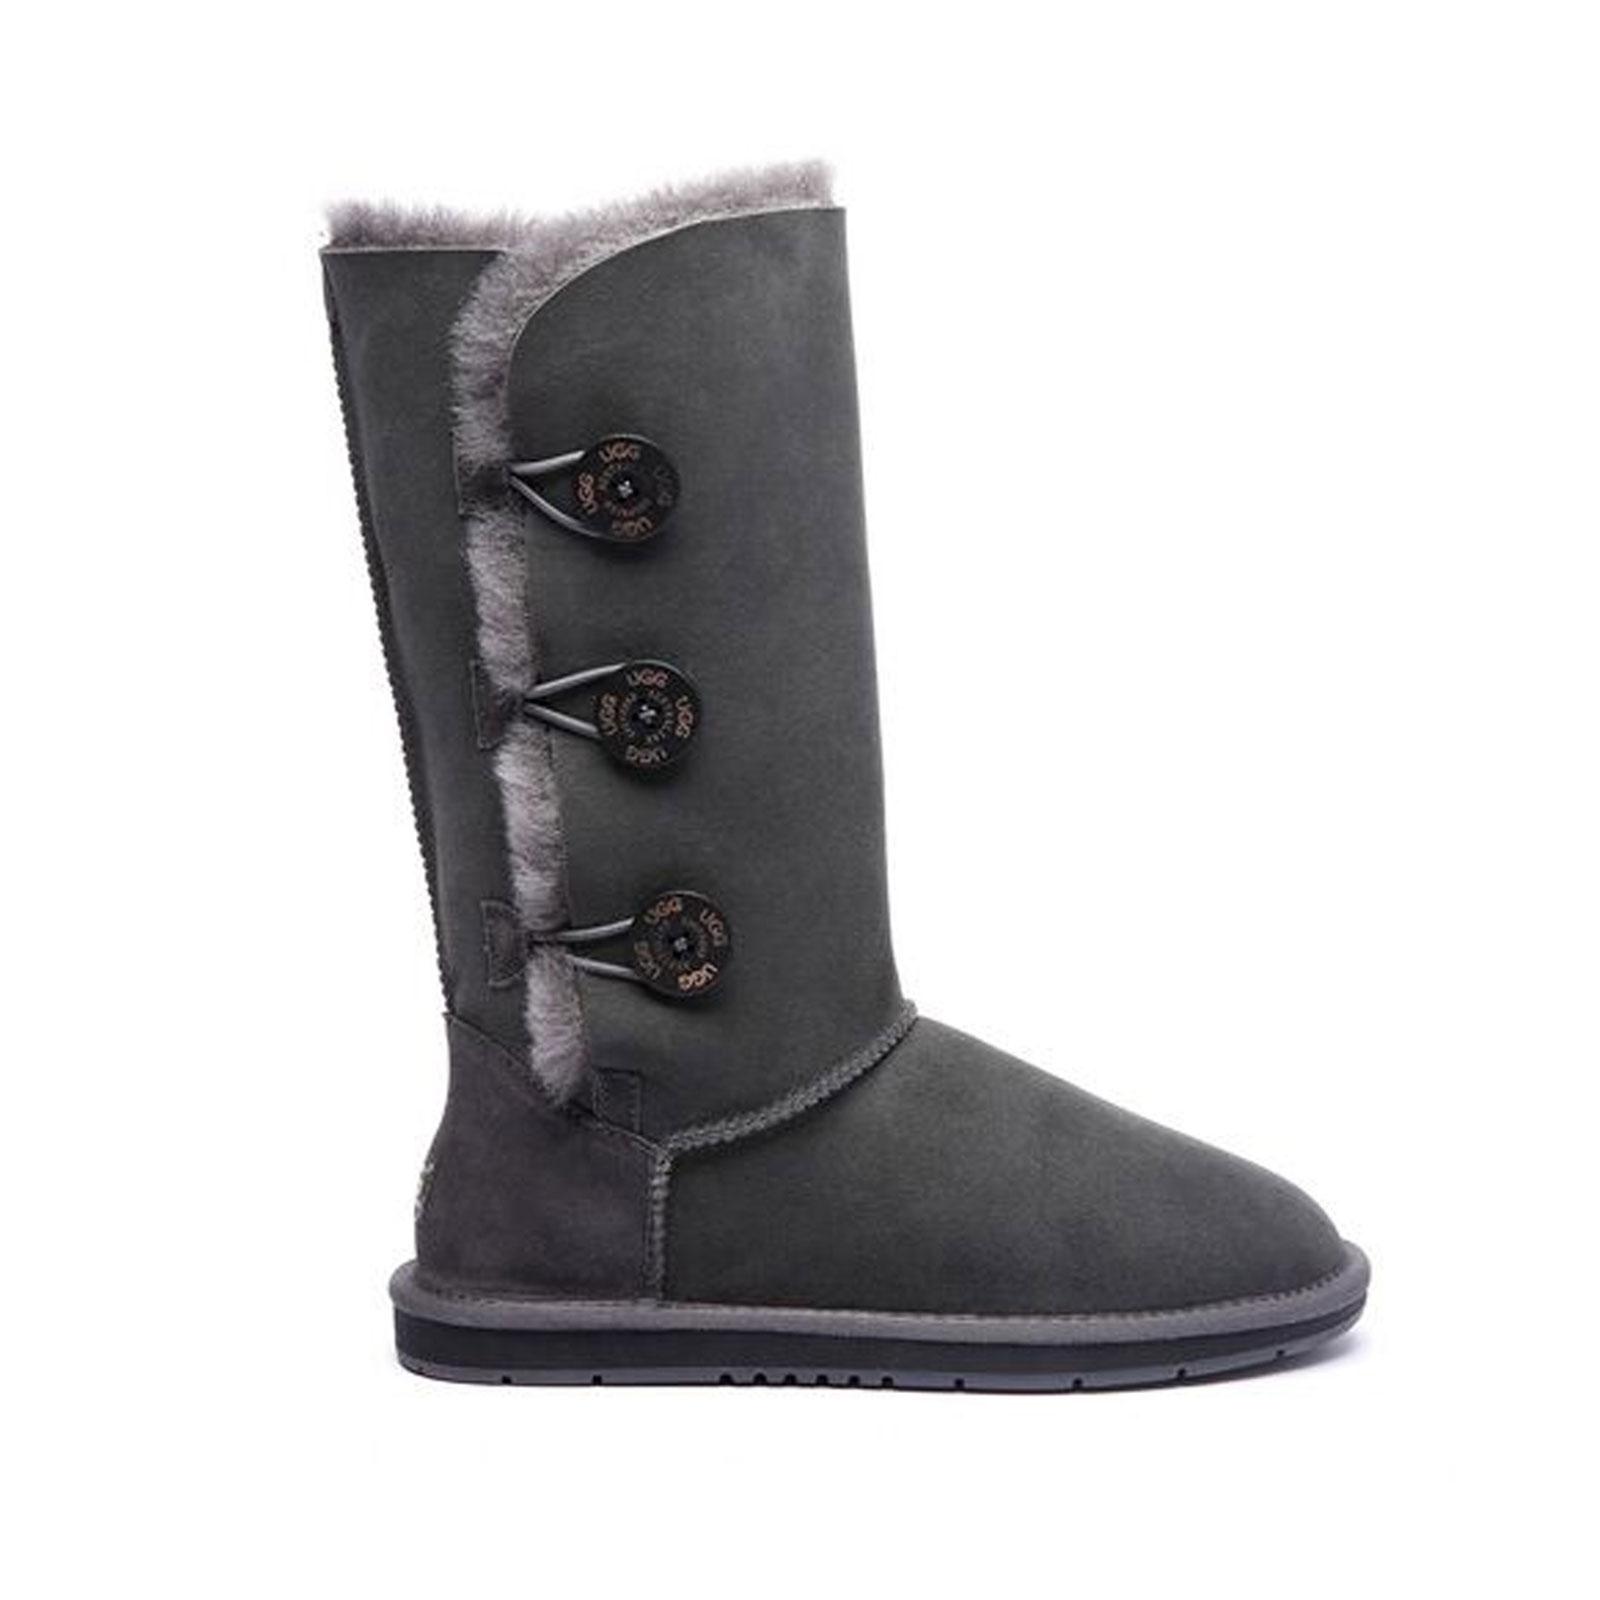 Ugg-Boots-Women-Men-Tall-Button-100-Australian-Sheepskin-Casual-Size-EU-35-44